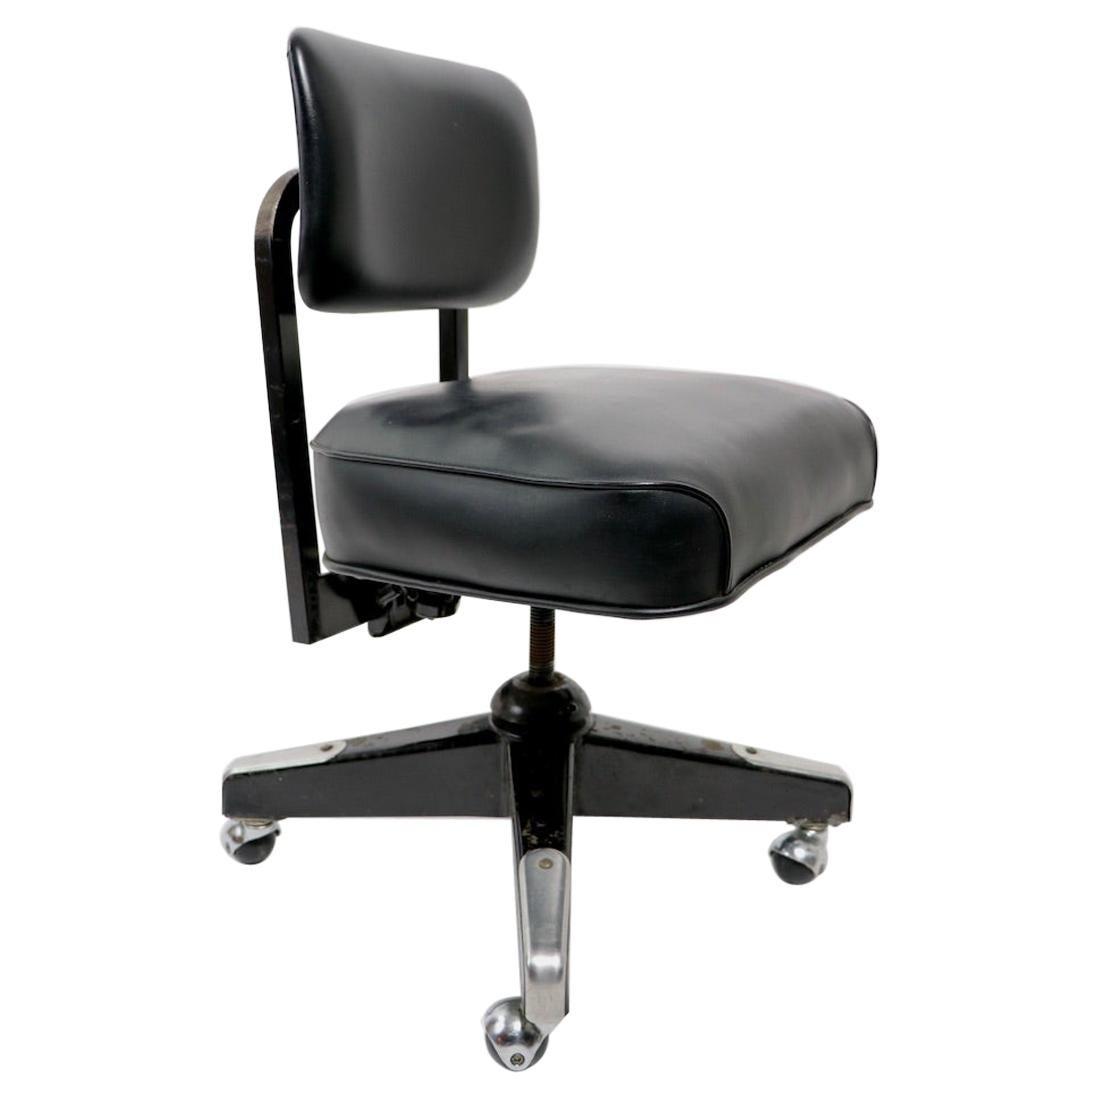 Swivel Desk Chair by Emeco